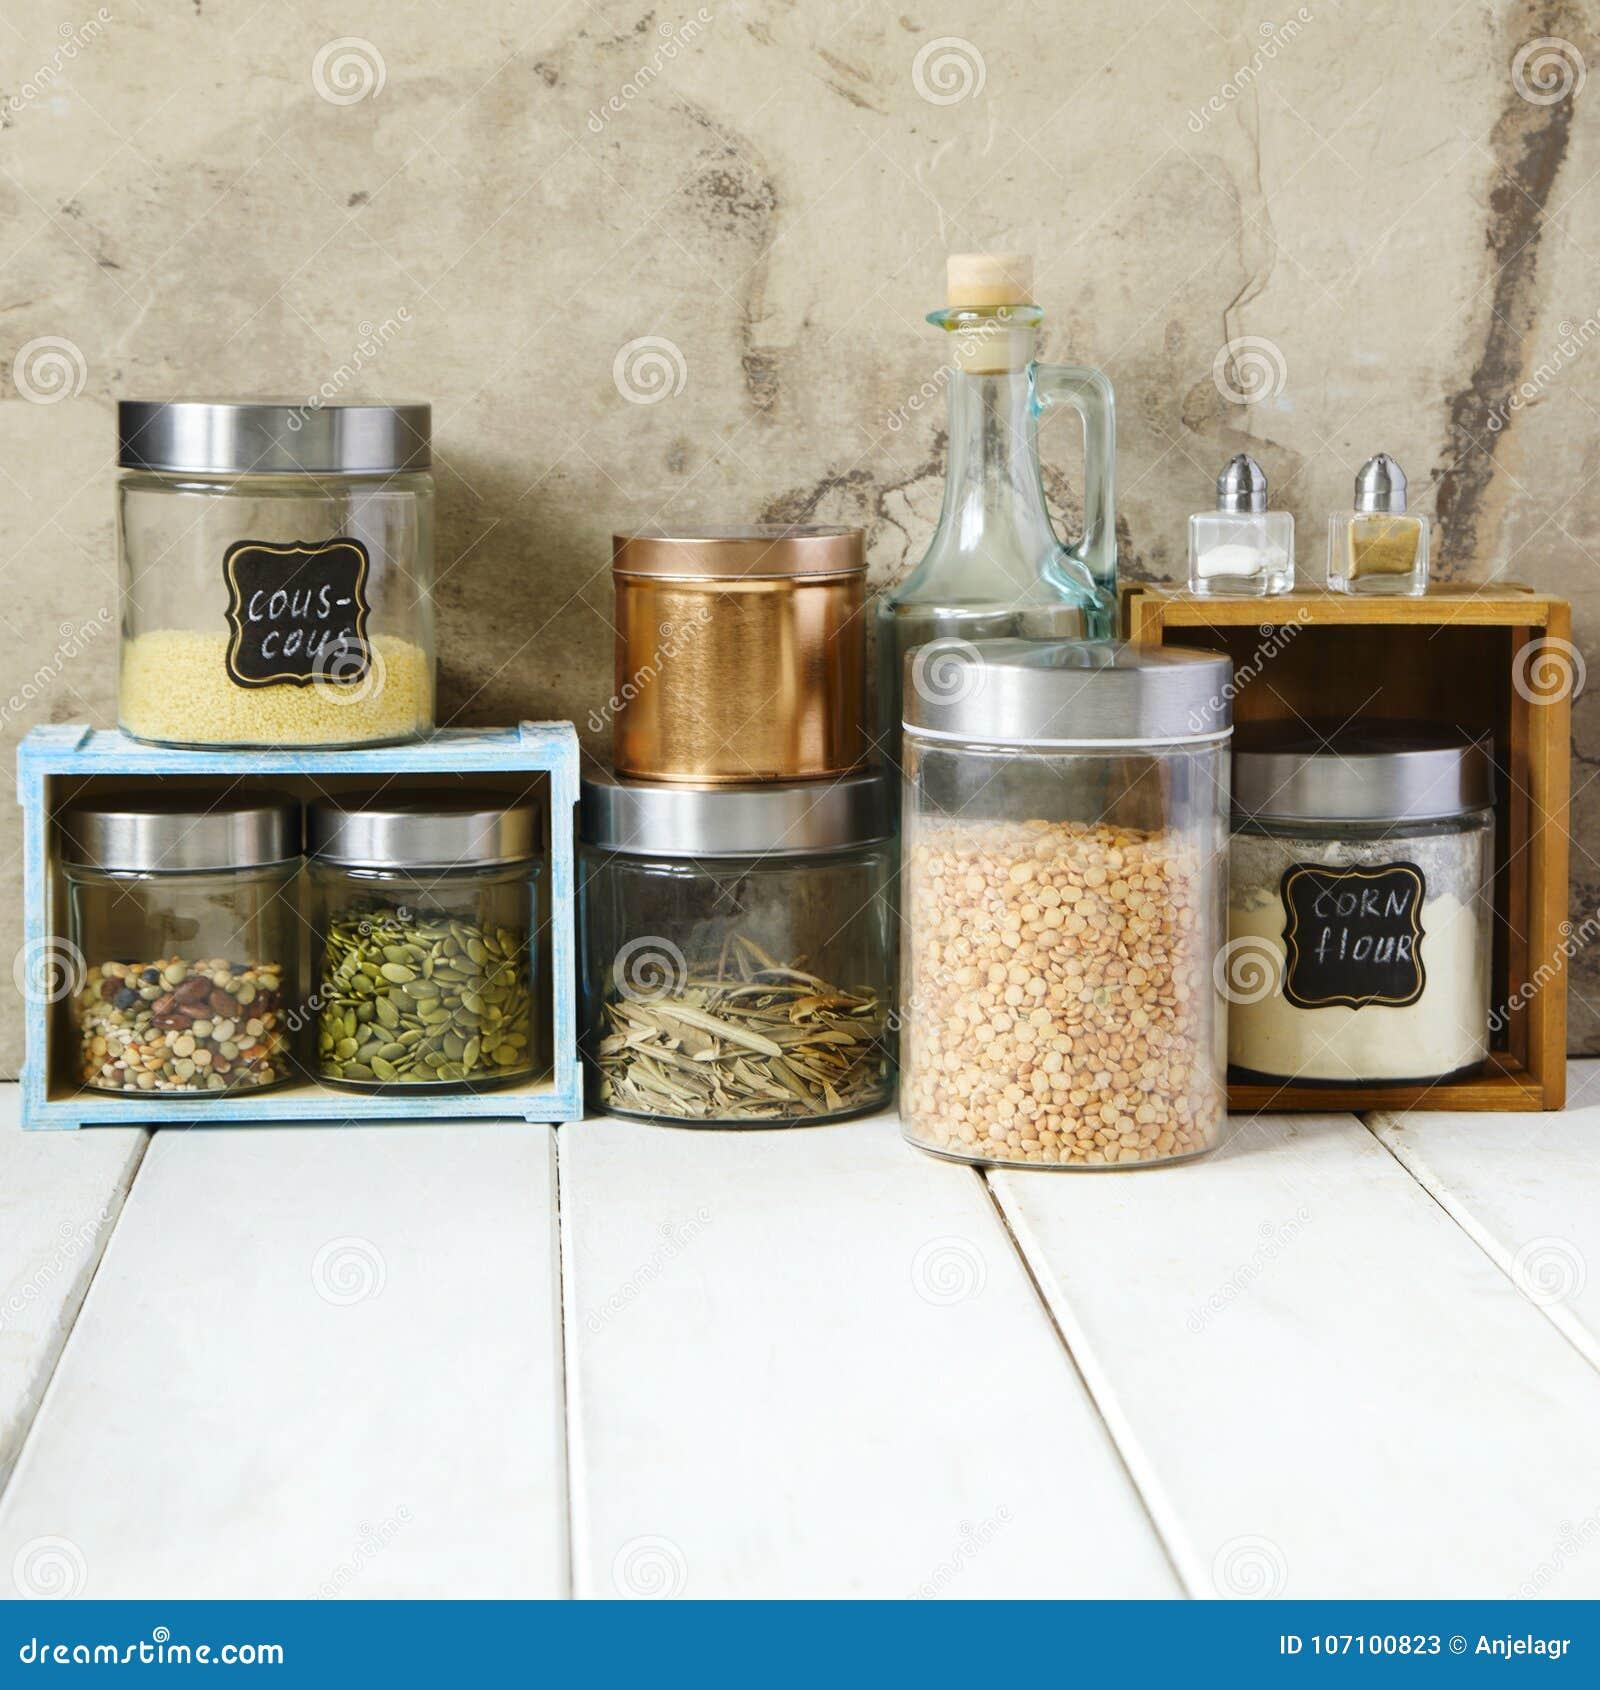 Kitchen Shelf Arrangement: Arrangement Of Dry Food Products And Kitchen Utensils In